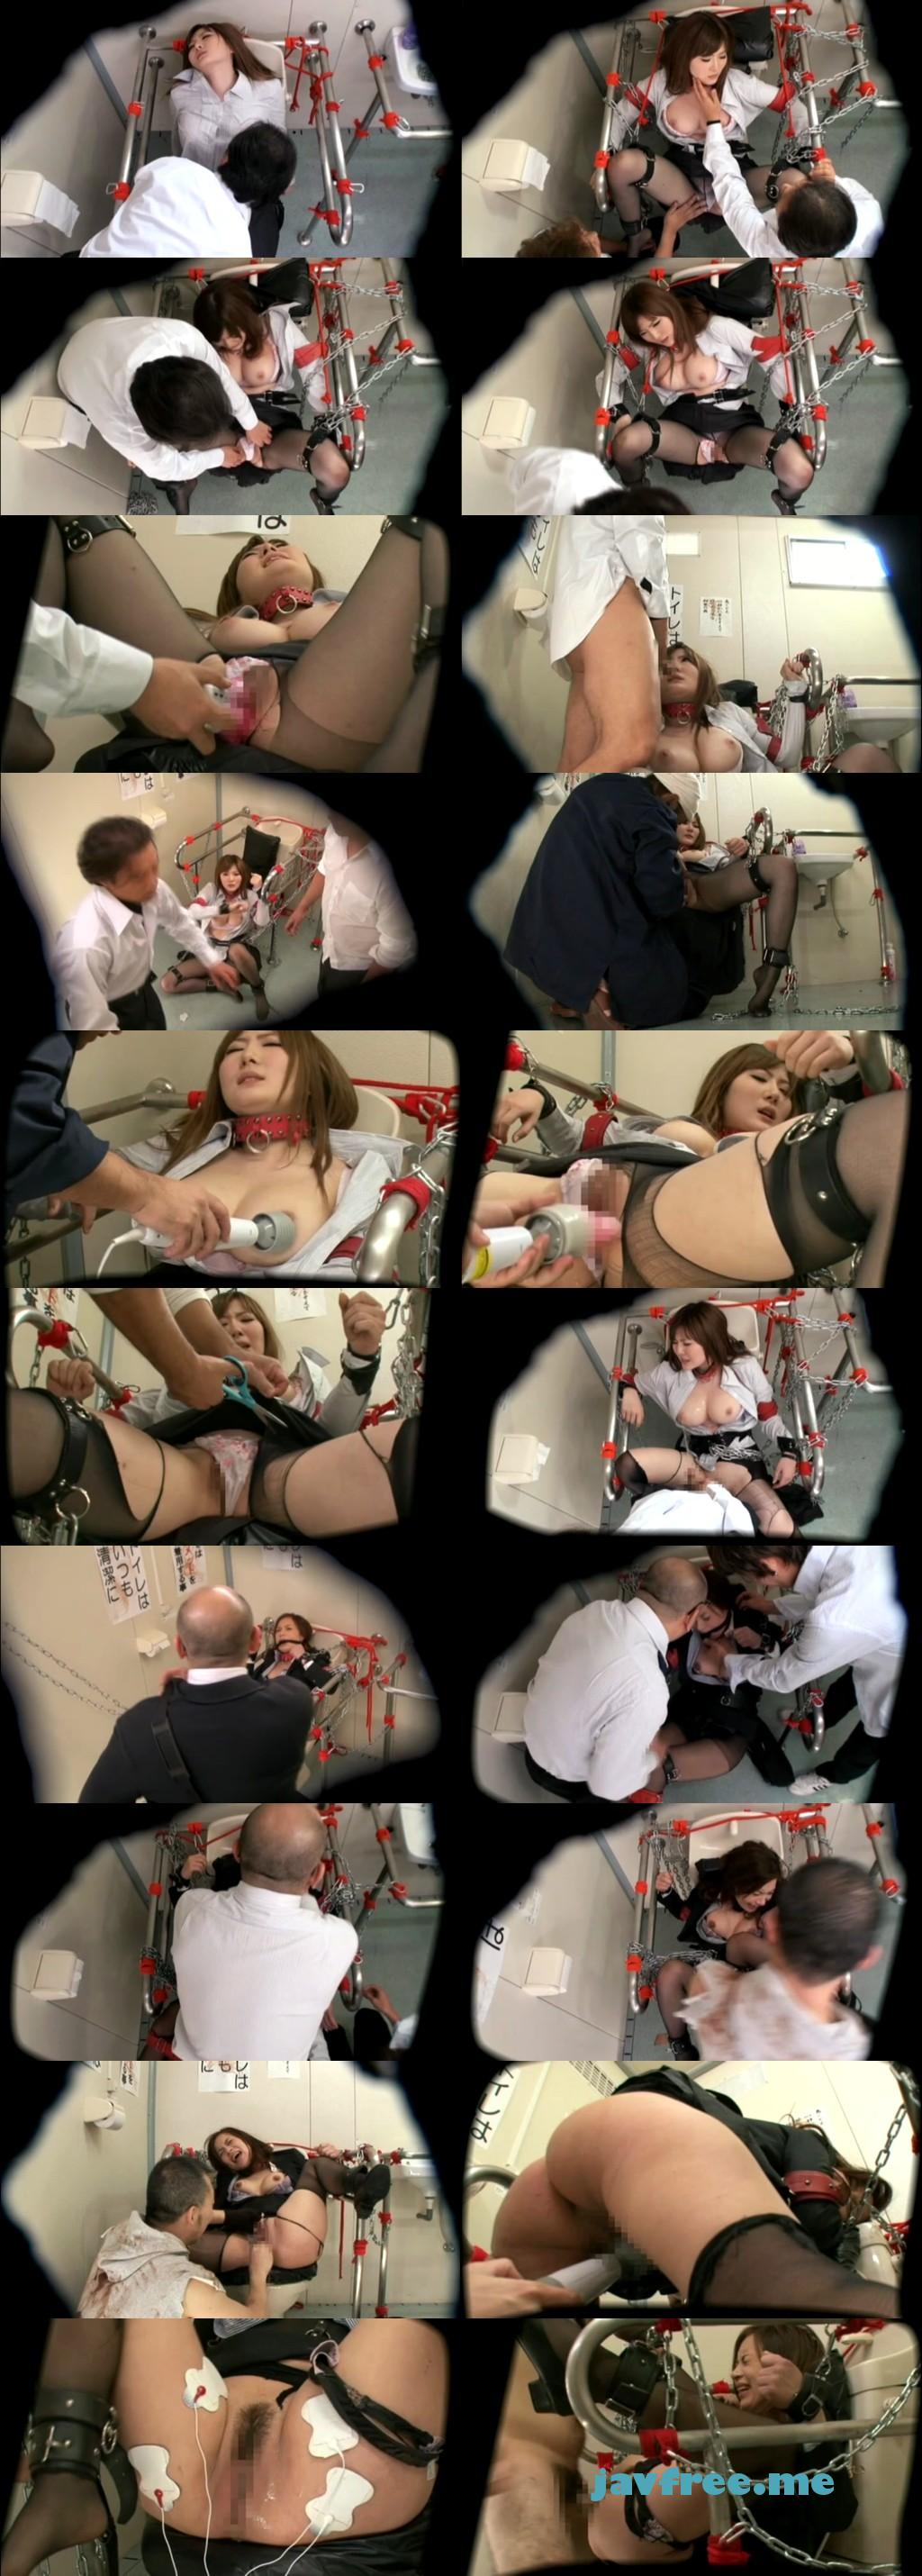 [SVDVD-278] 拷問 女教師中出し拘束肉便器 仁科百華 RISA - image svdvd278 on https://javfree.me